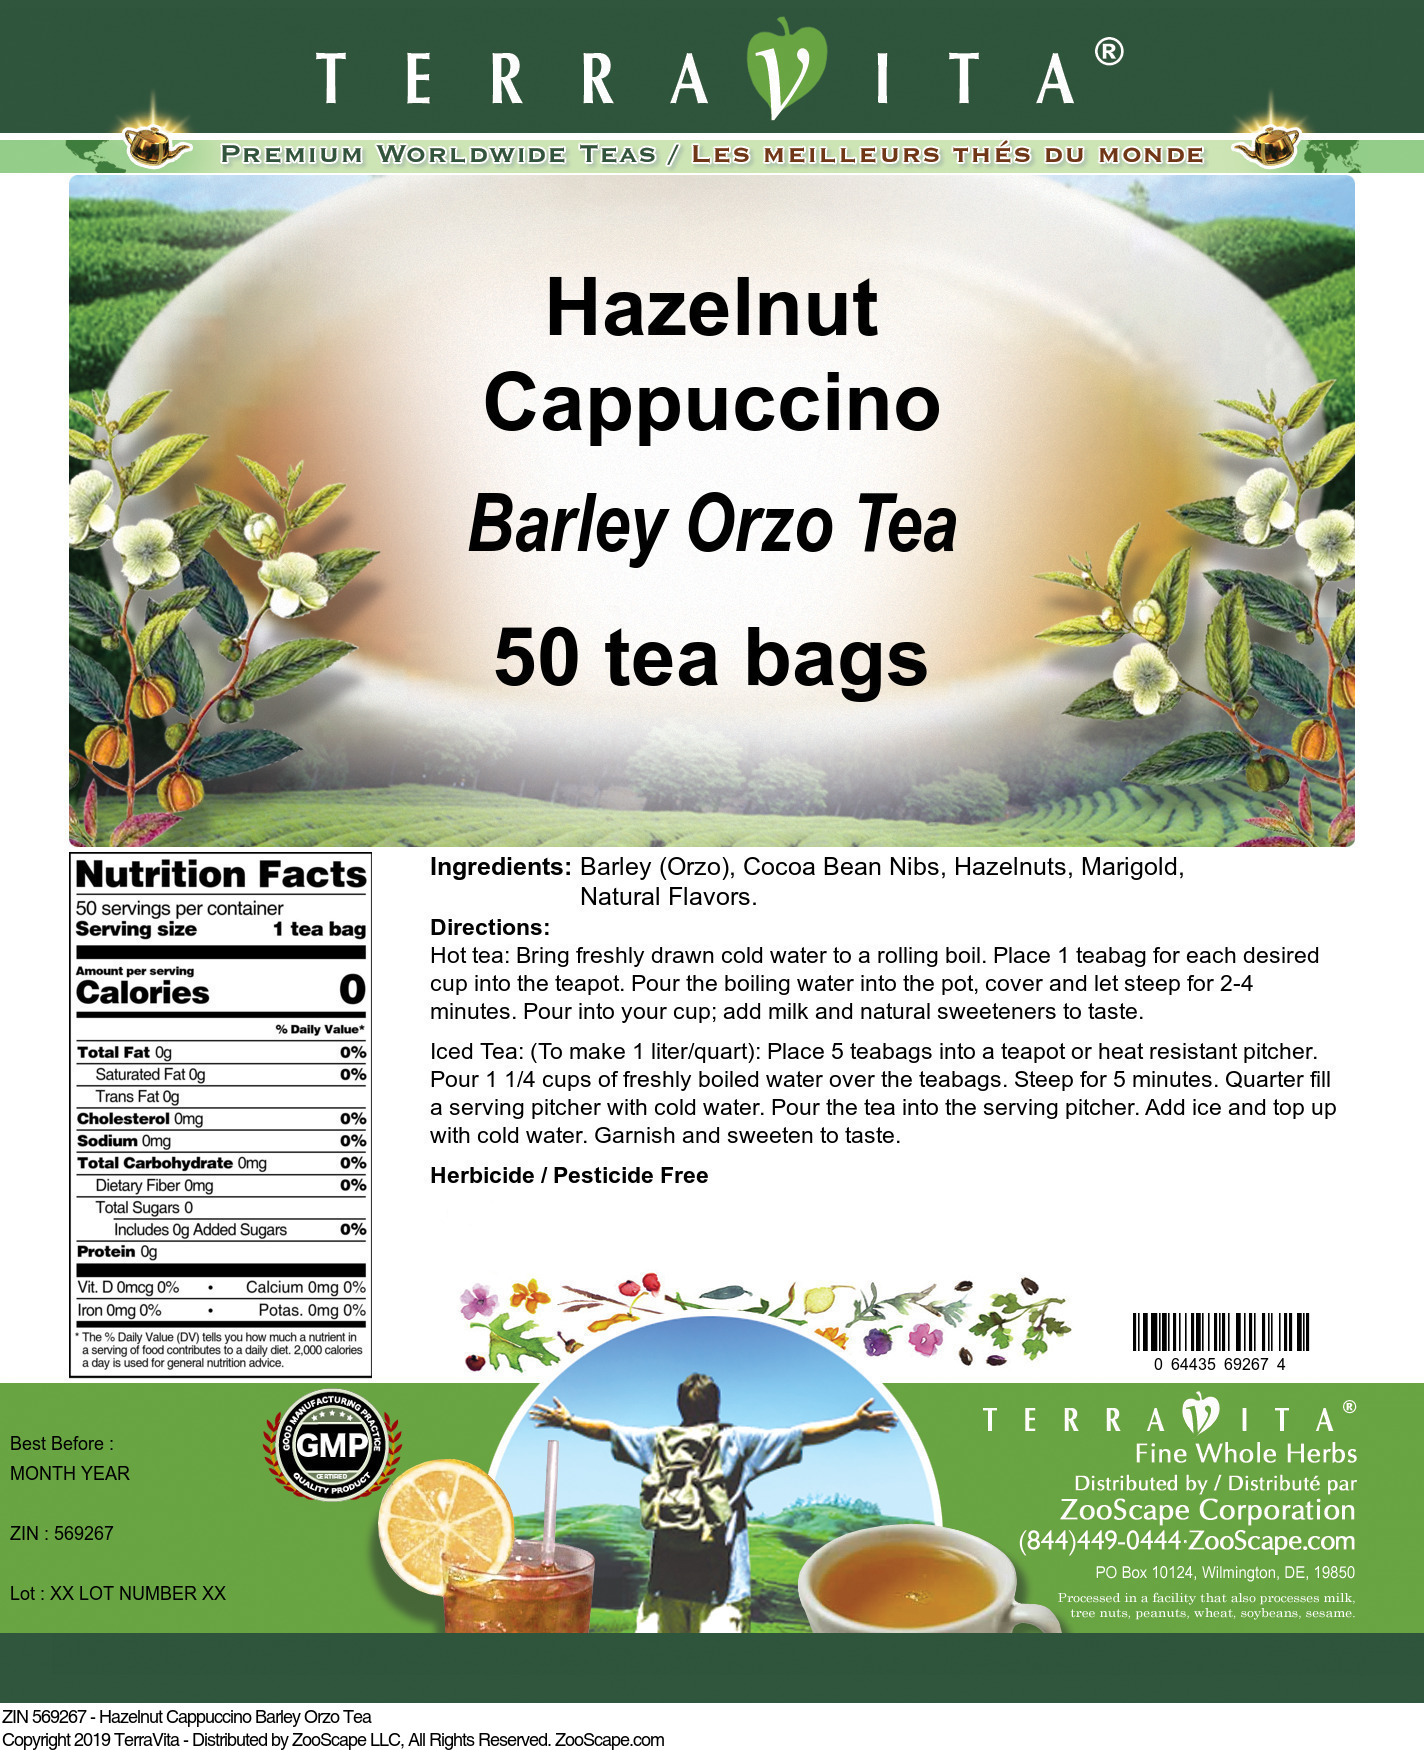 Hazelnut Cappuccino Barley Orzo Tea